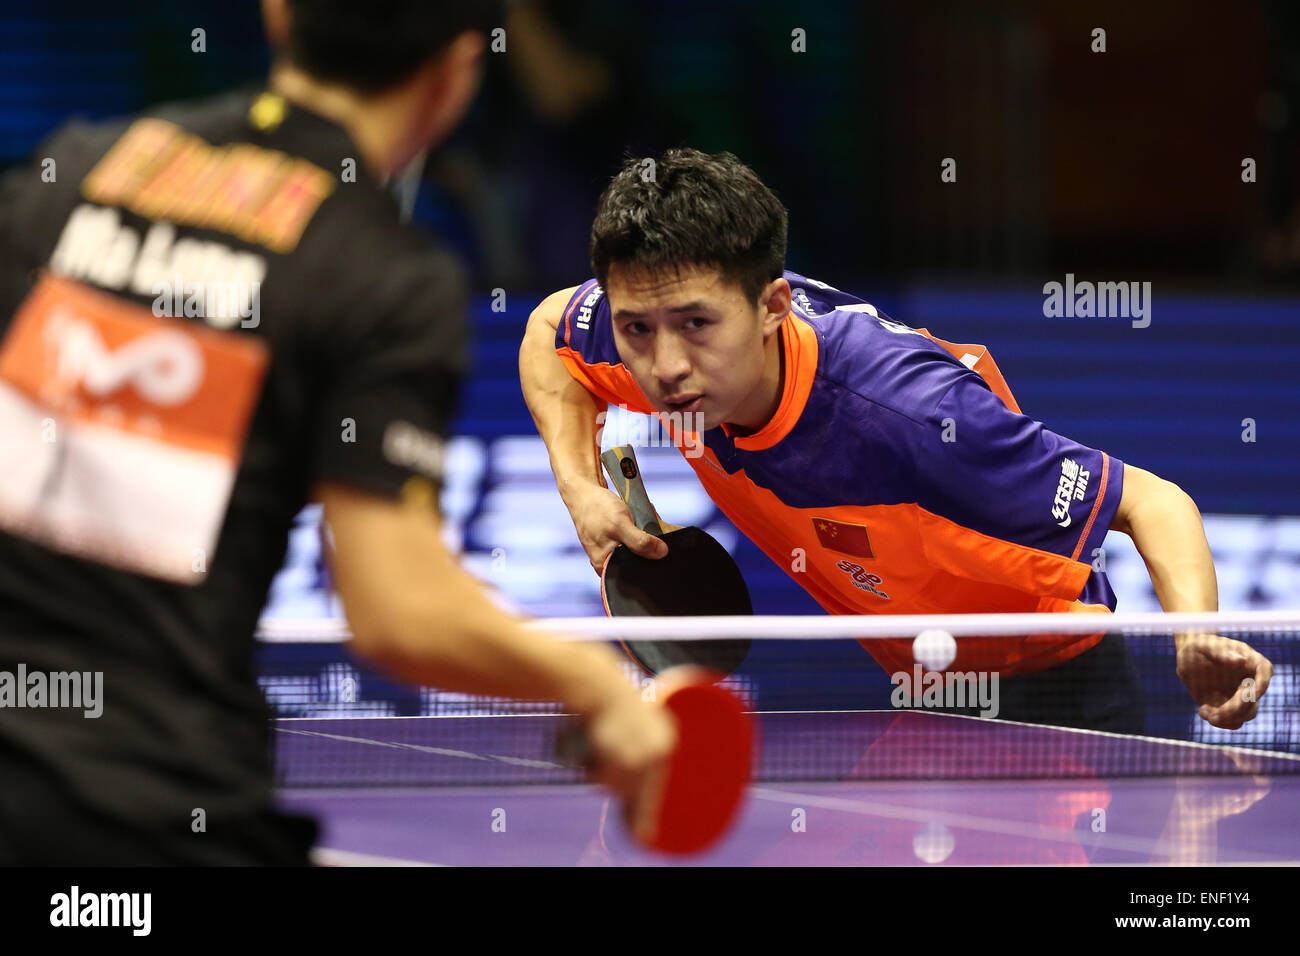 Suzhou International Expo Centre, Suzhou, China. 3. Mai 2015. Fang Bo (CHN), 3. Mai 2015 - Tischtennis: 2015 match Stockbild